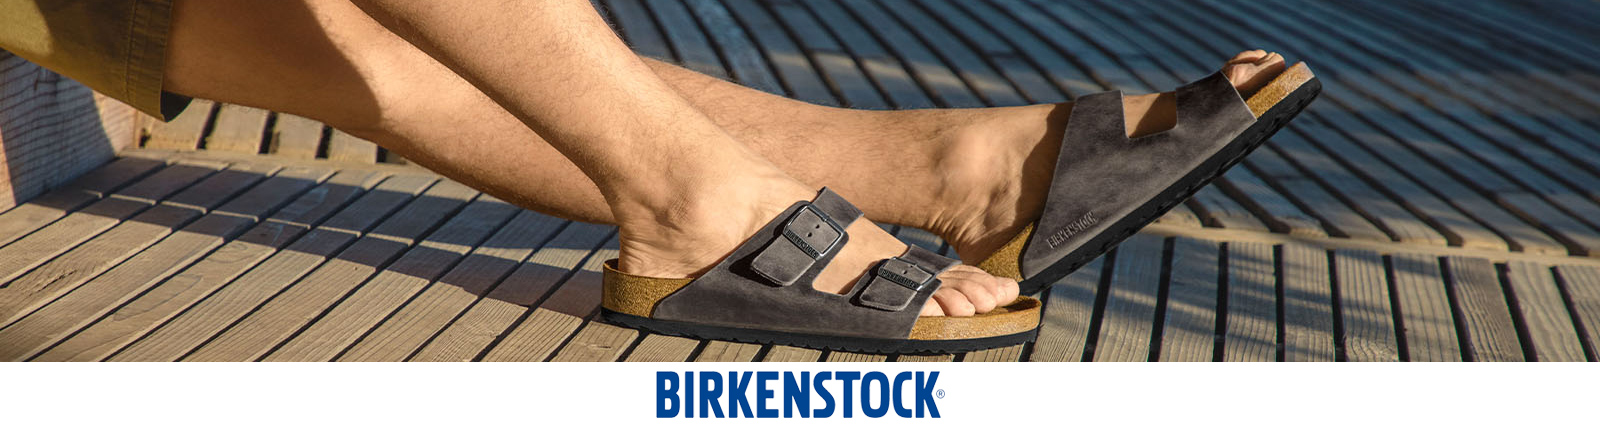 birkenstock-brand-banner-spring-2020a.jpg